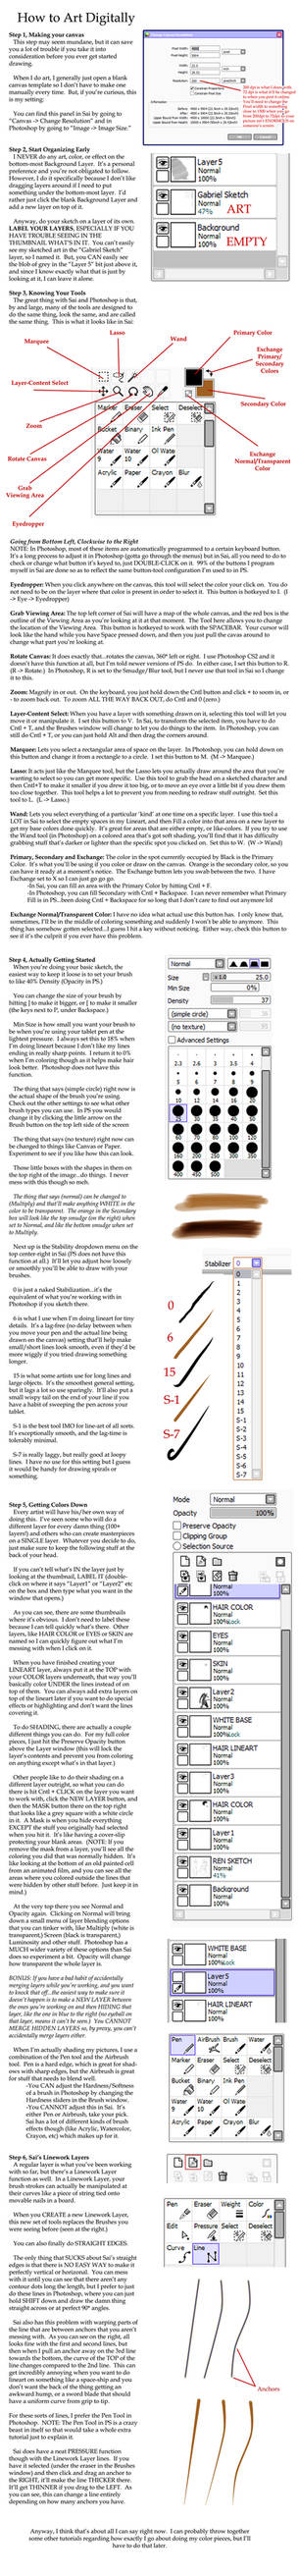 How to Art Digitally